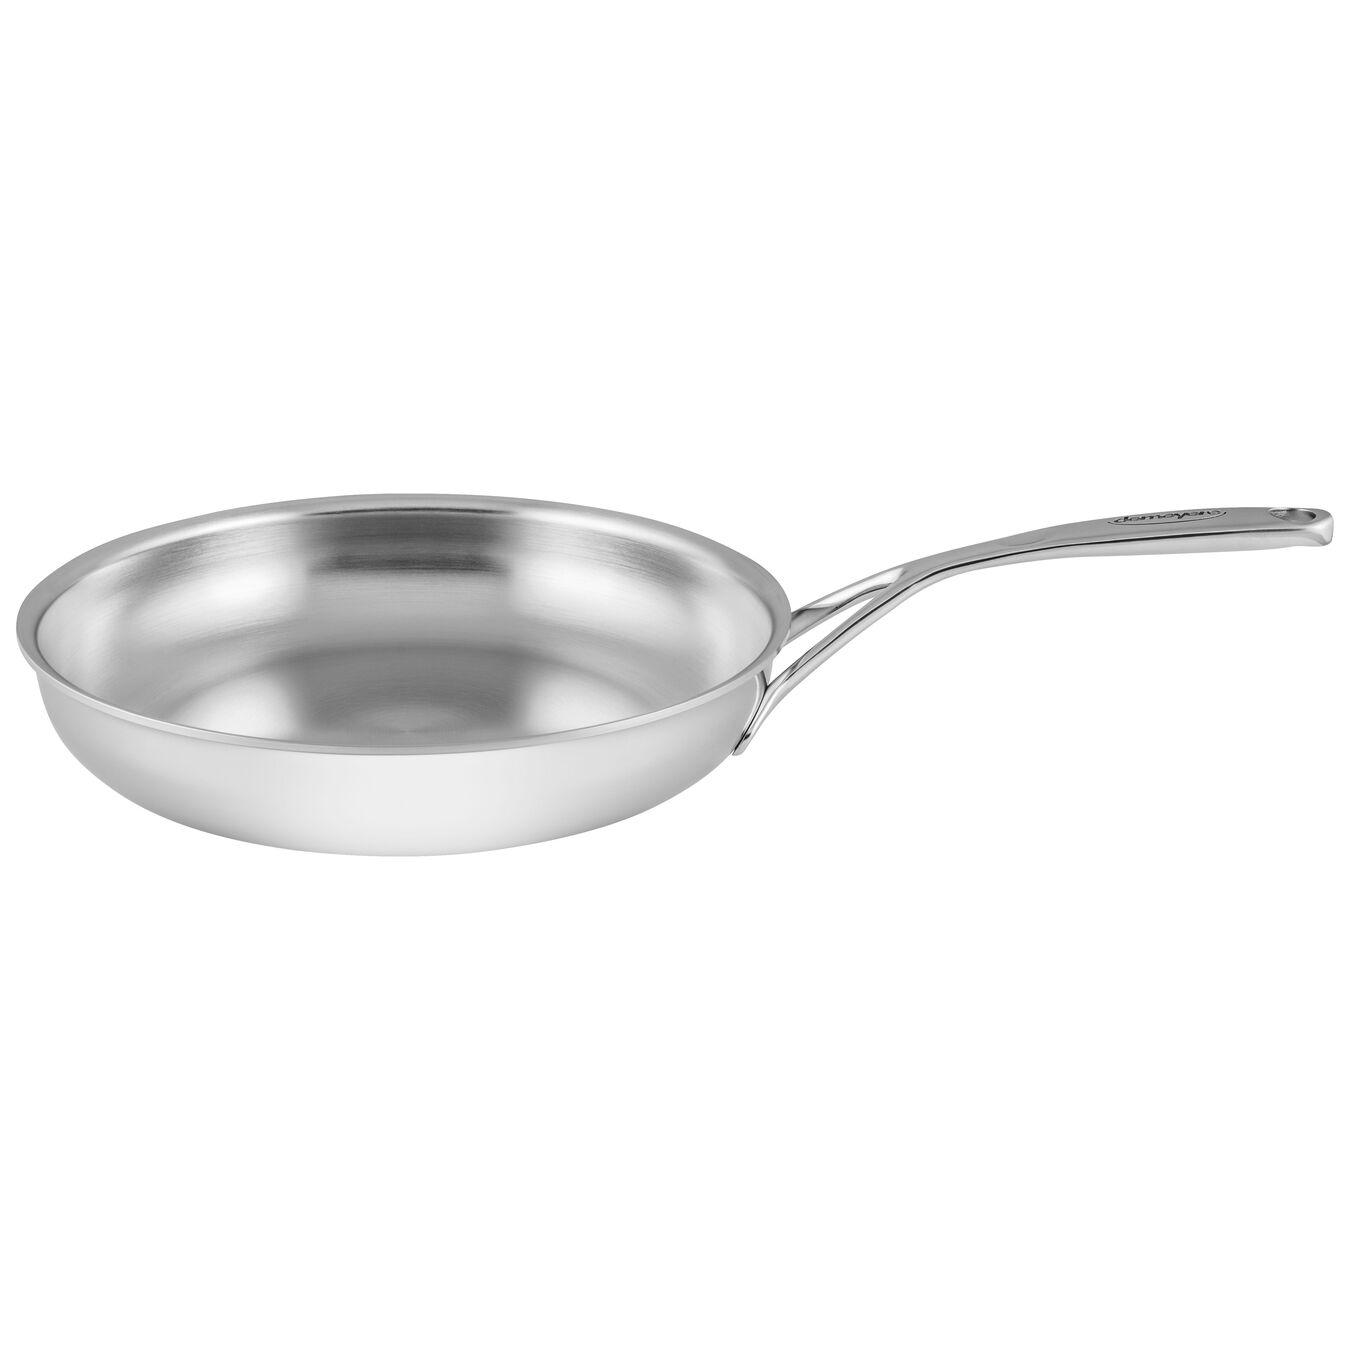 Koekenpan Zilver 28 cm,,large 1